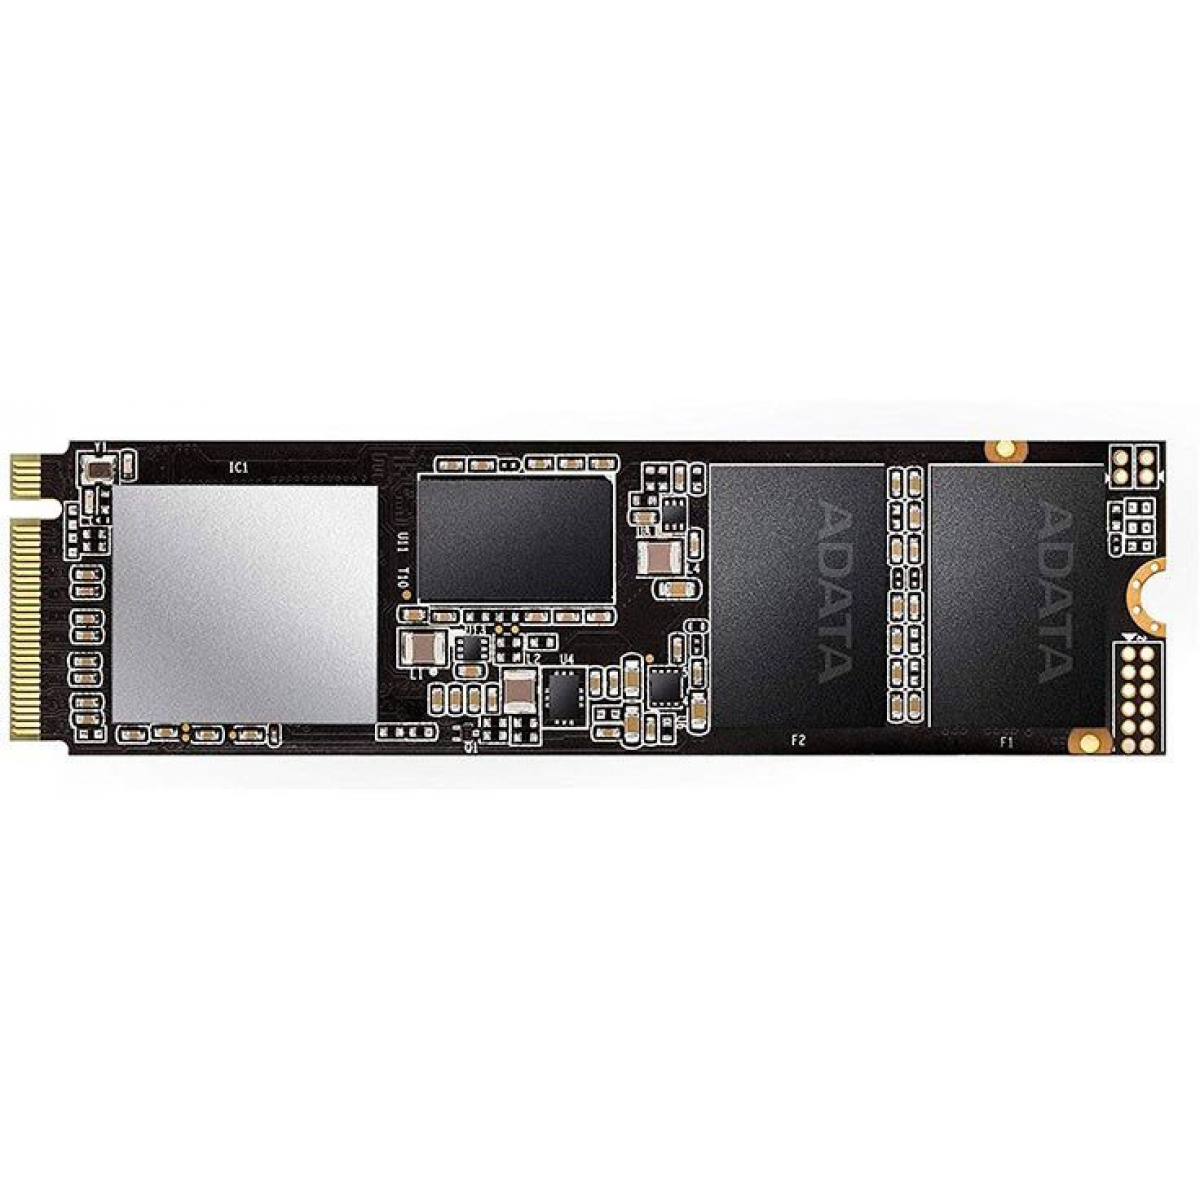 SSD XPG SX8200 PRO, 512GB, M.2 2280, NVMe, Leitura: 3500MBs e Gravação: 3000MBs, ASX8200PNP-512GT-C